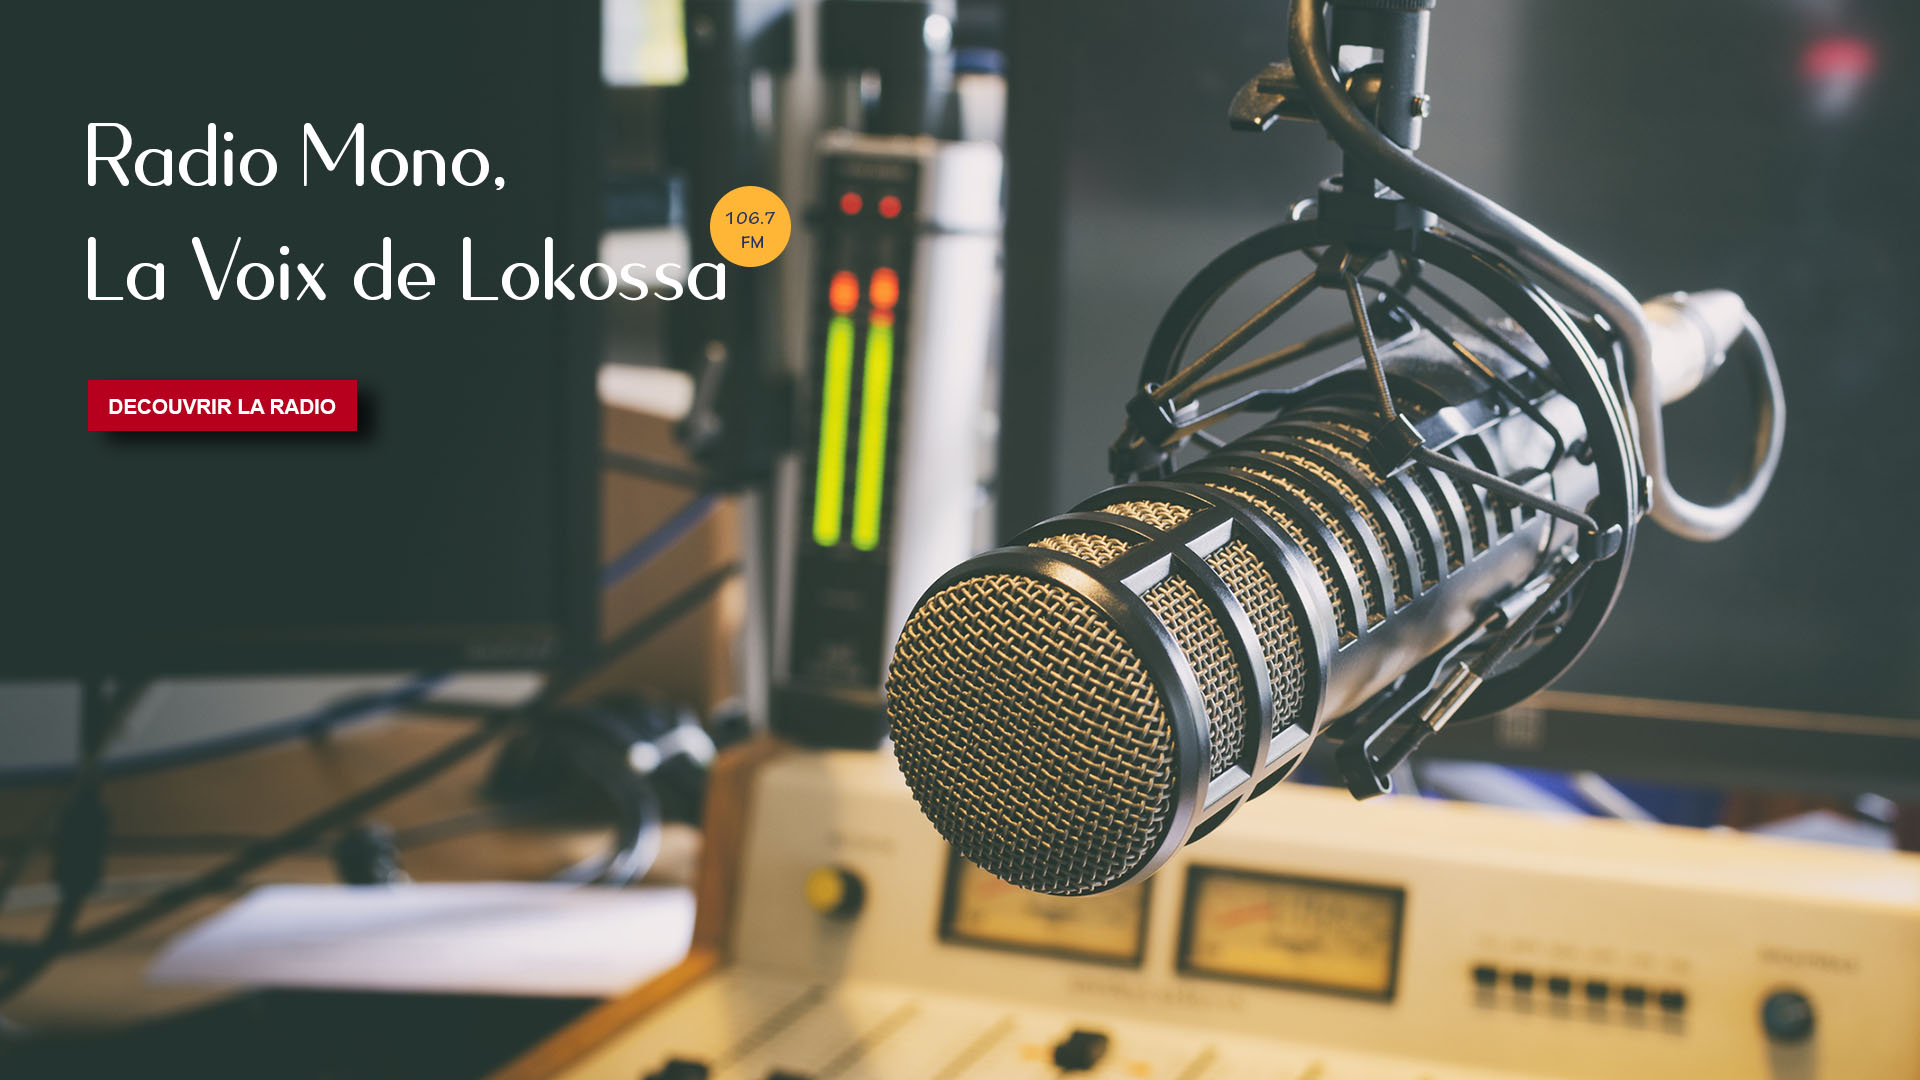 Bienvenue sur le portail de Radio Mono, la voix de Lokossa